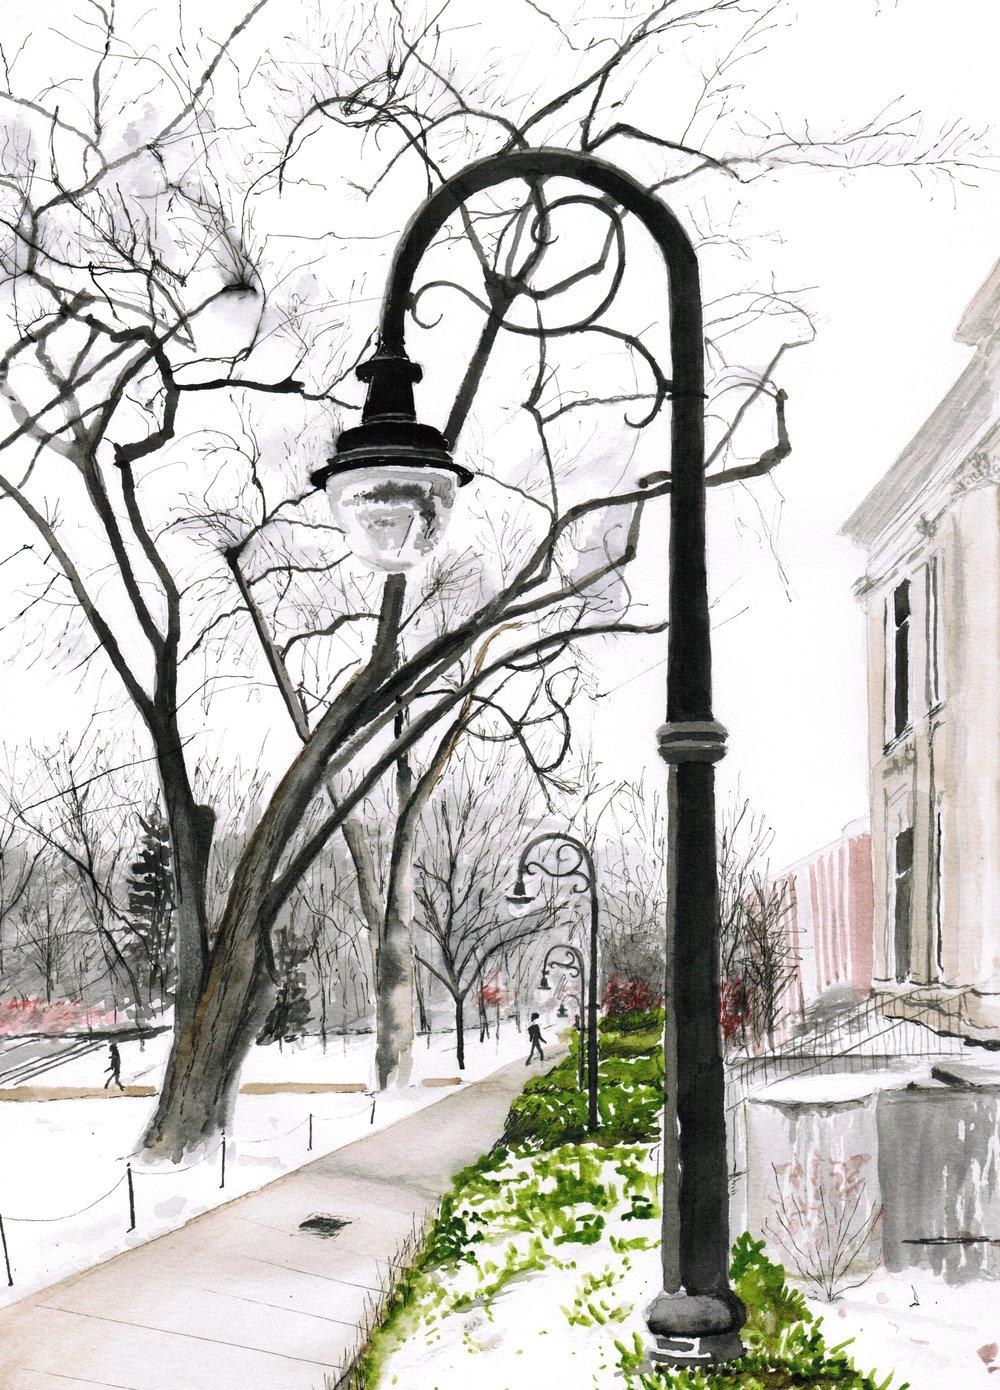 Streetlight; pen, ink and wash; 2017